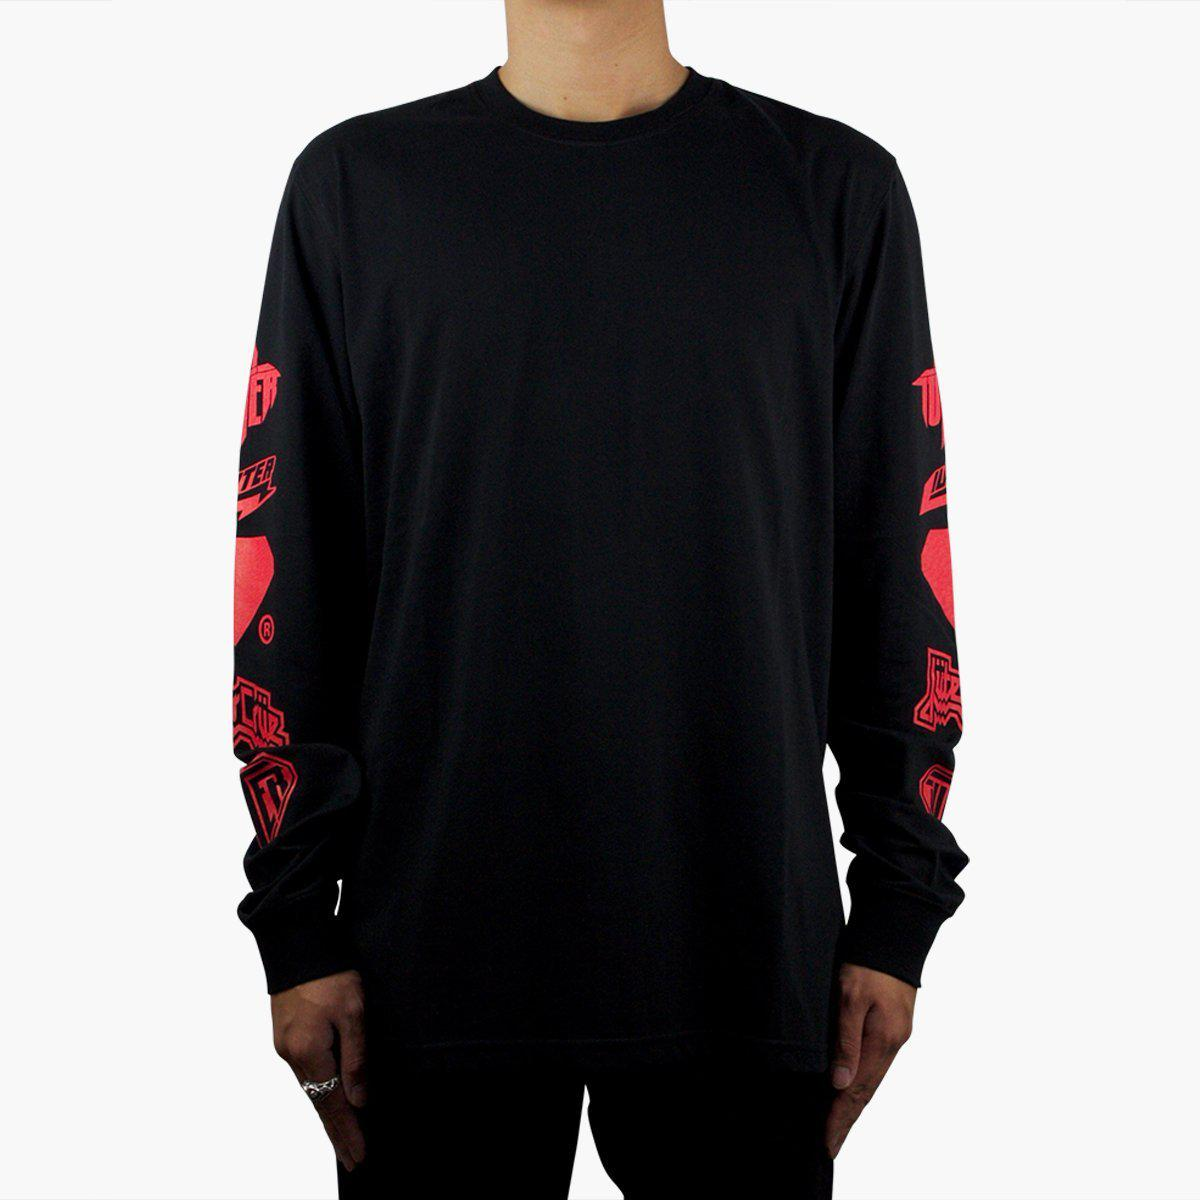 Iuter screen printed long sleeve t shirt in black for men for Long sleeve t shirt printing